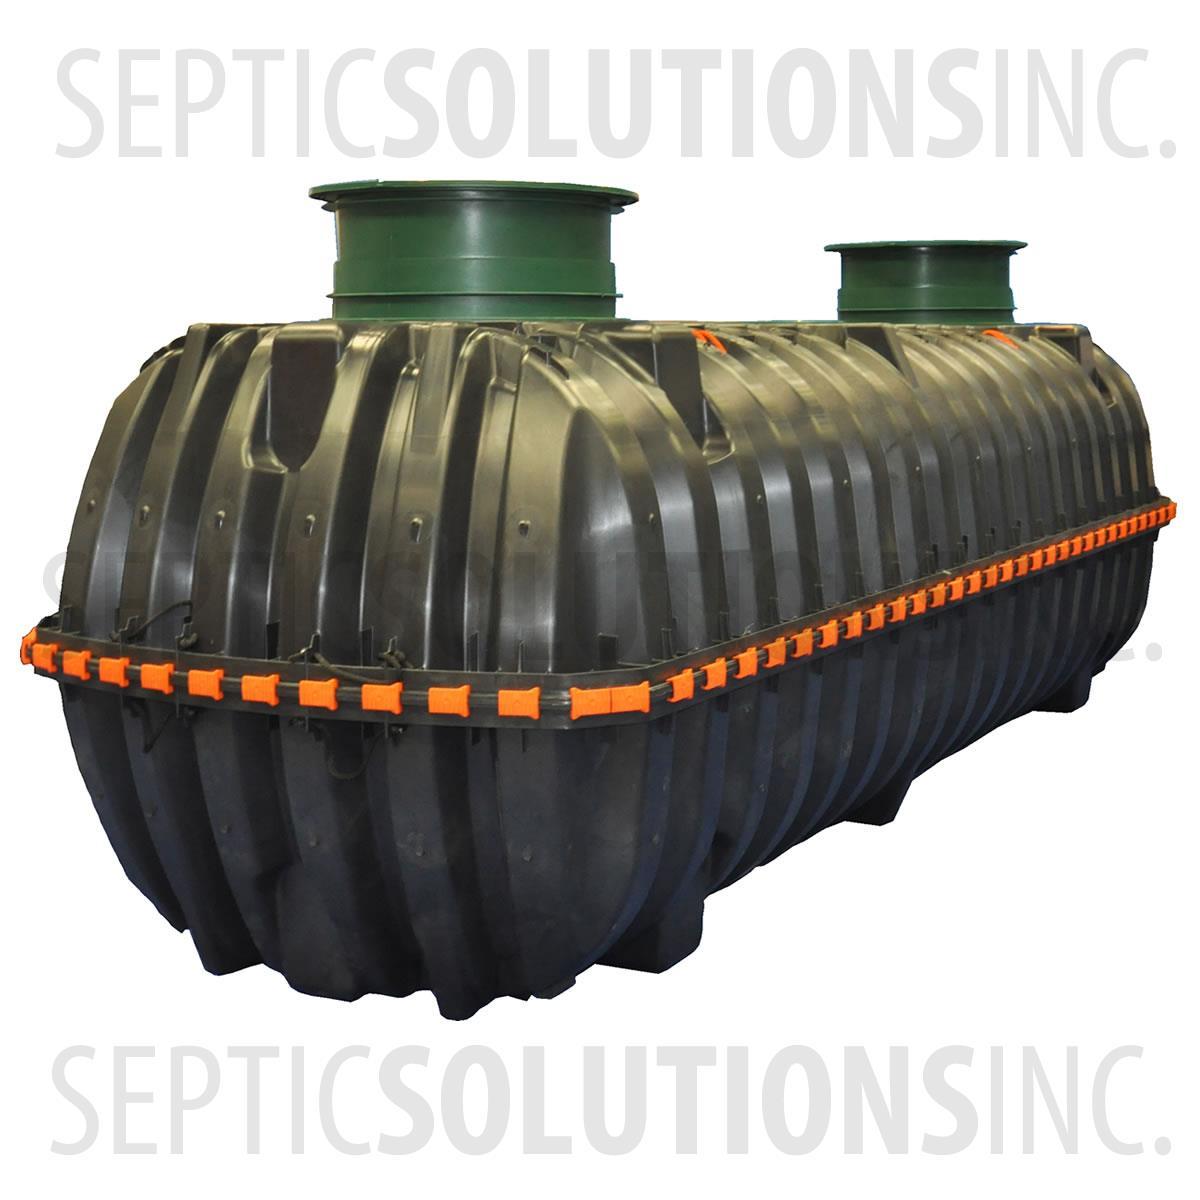 Infiltrator 1060 Gallon Septic Tank Im1060 Septic